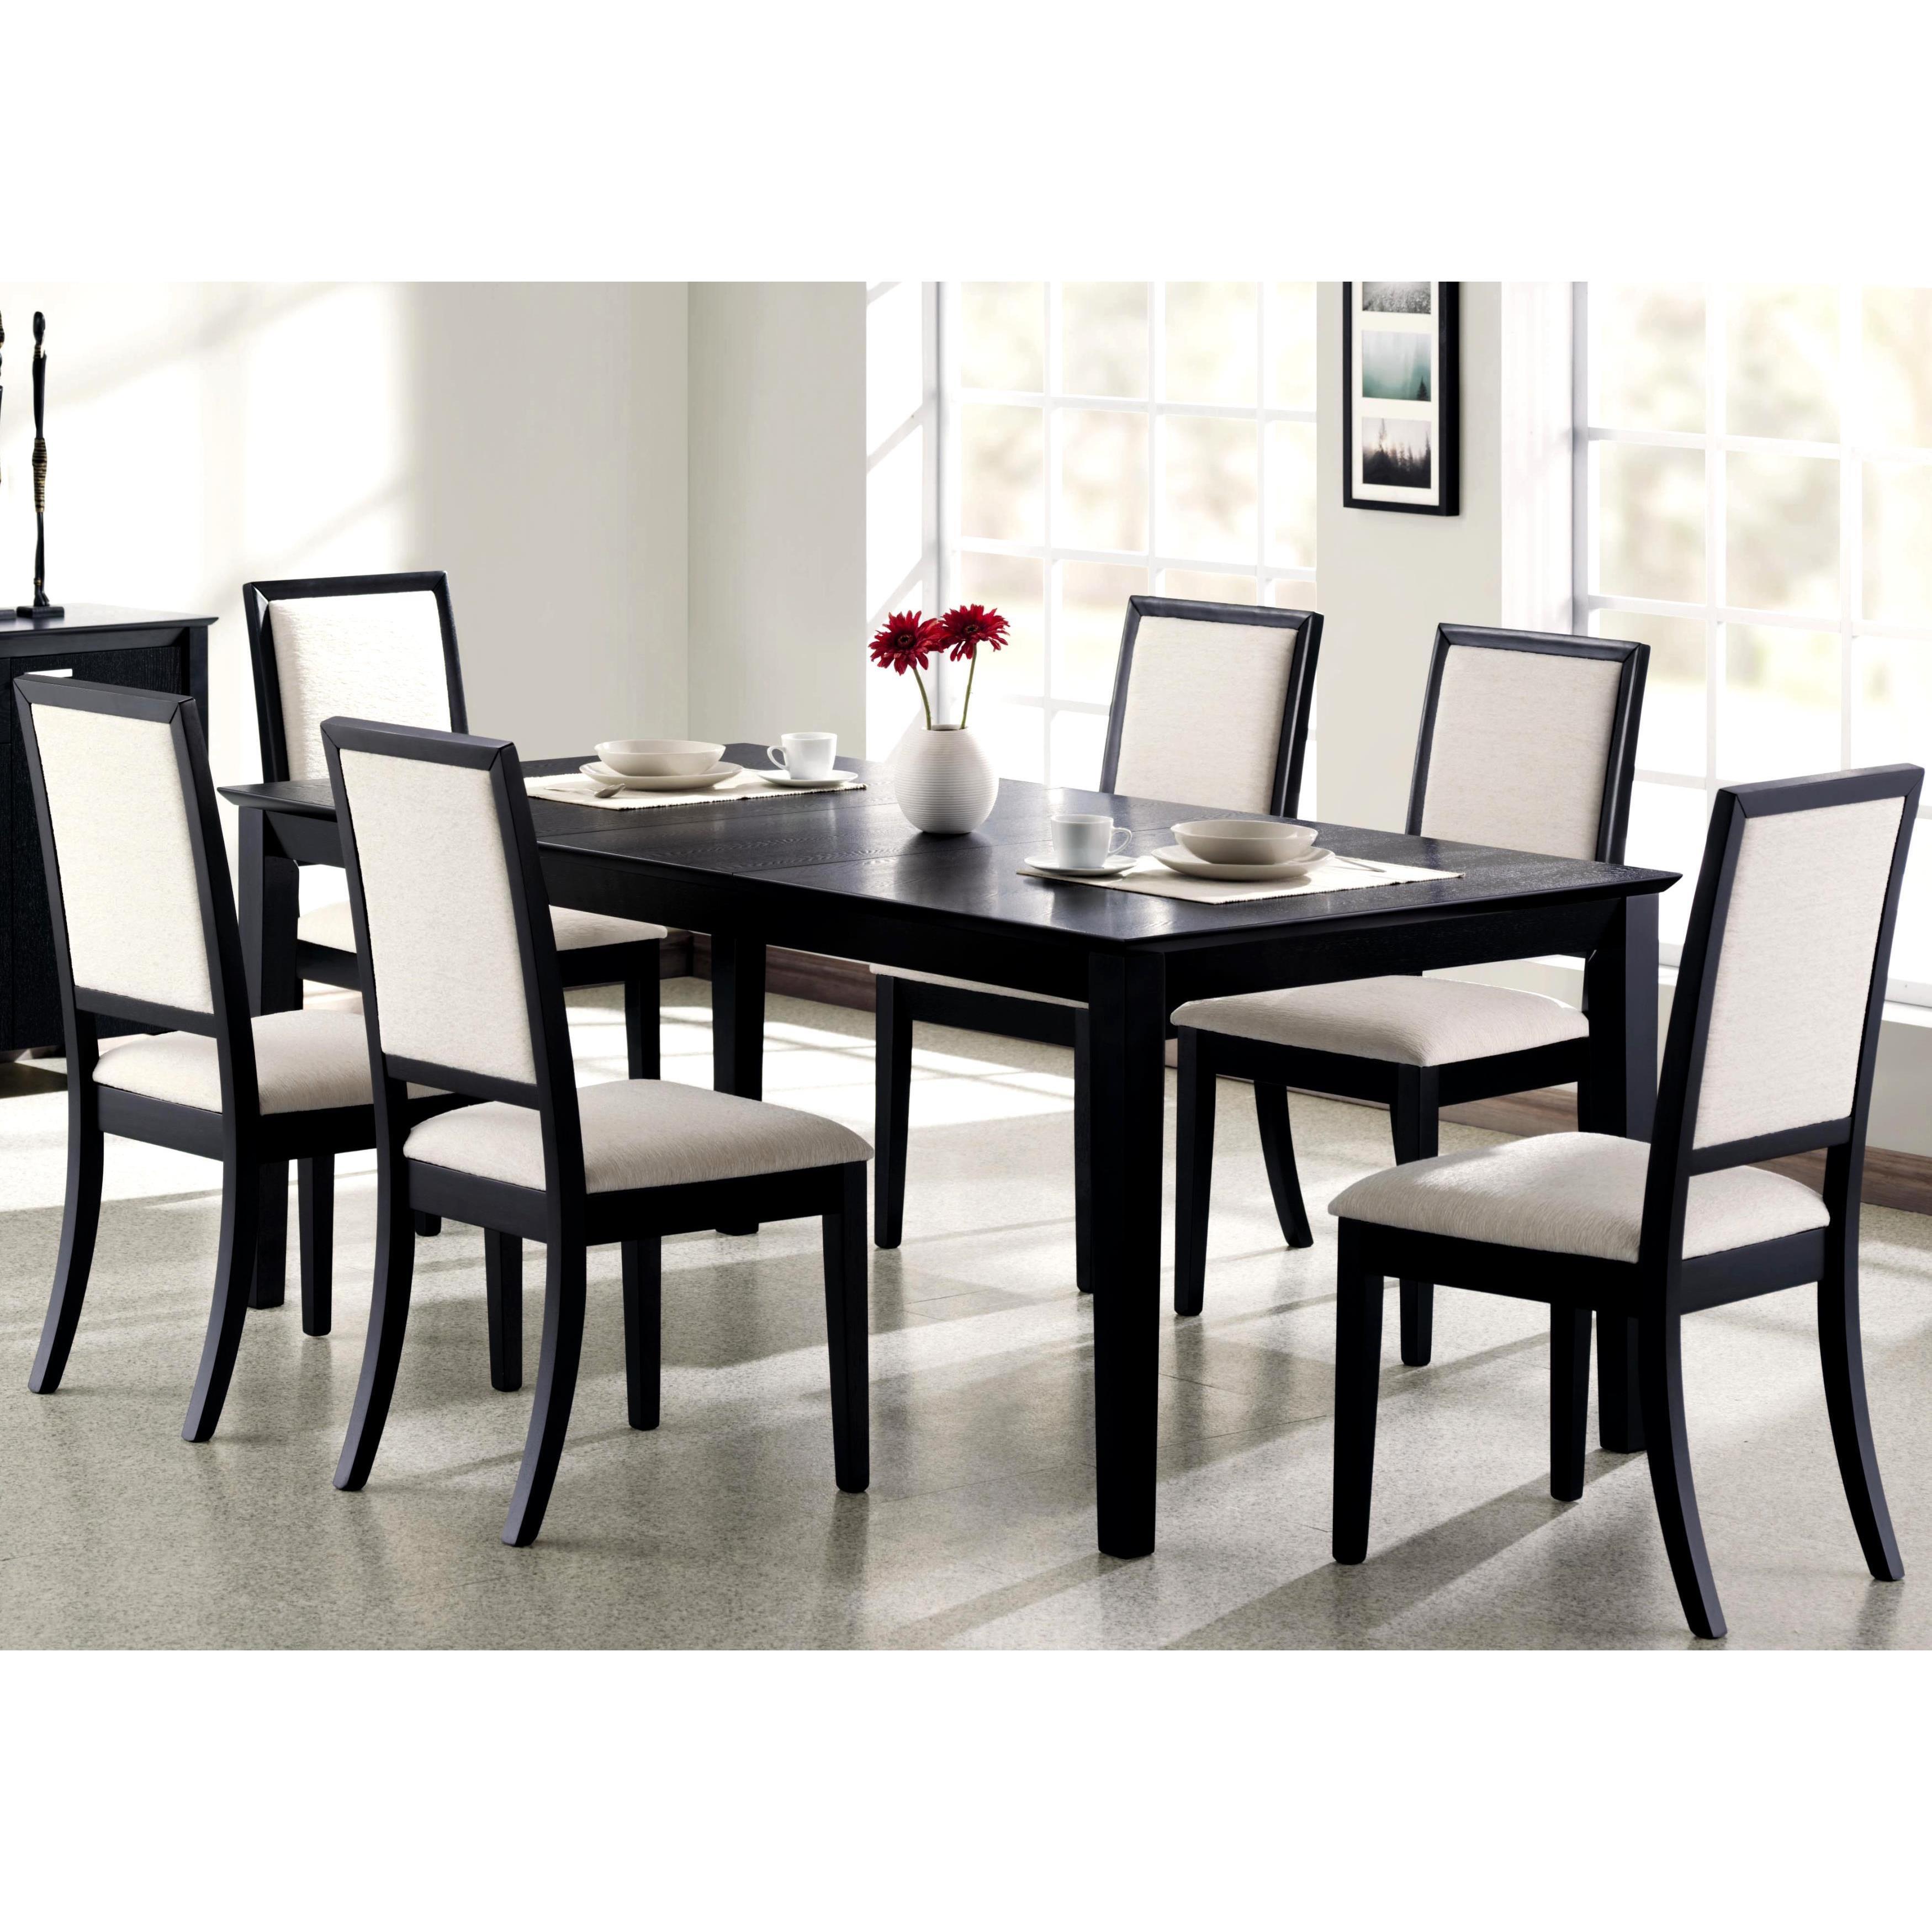 Prestige Cream White Upholstered Black Wood Dining Set Overstock 10691278